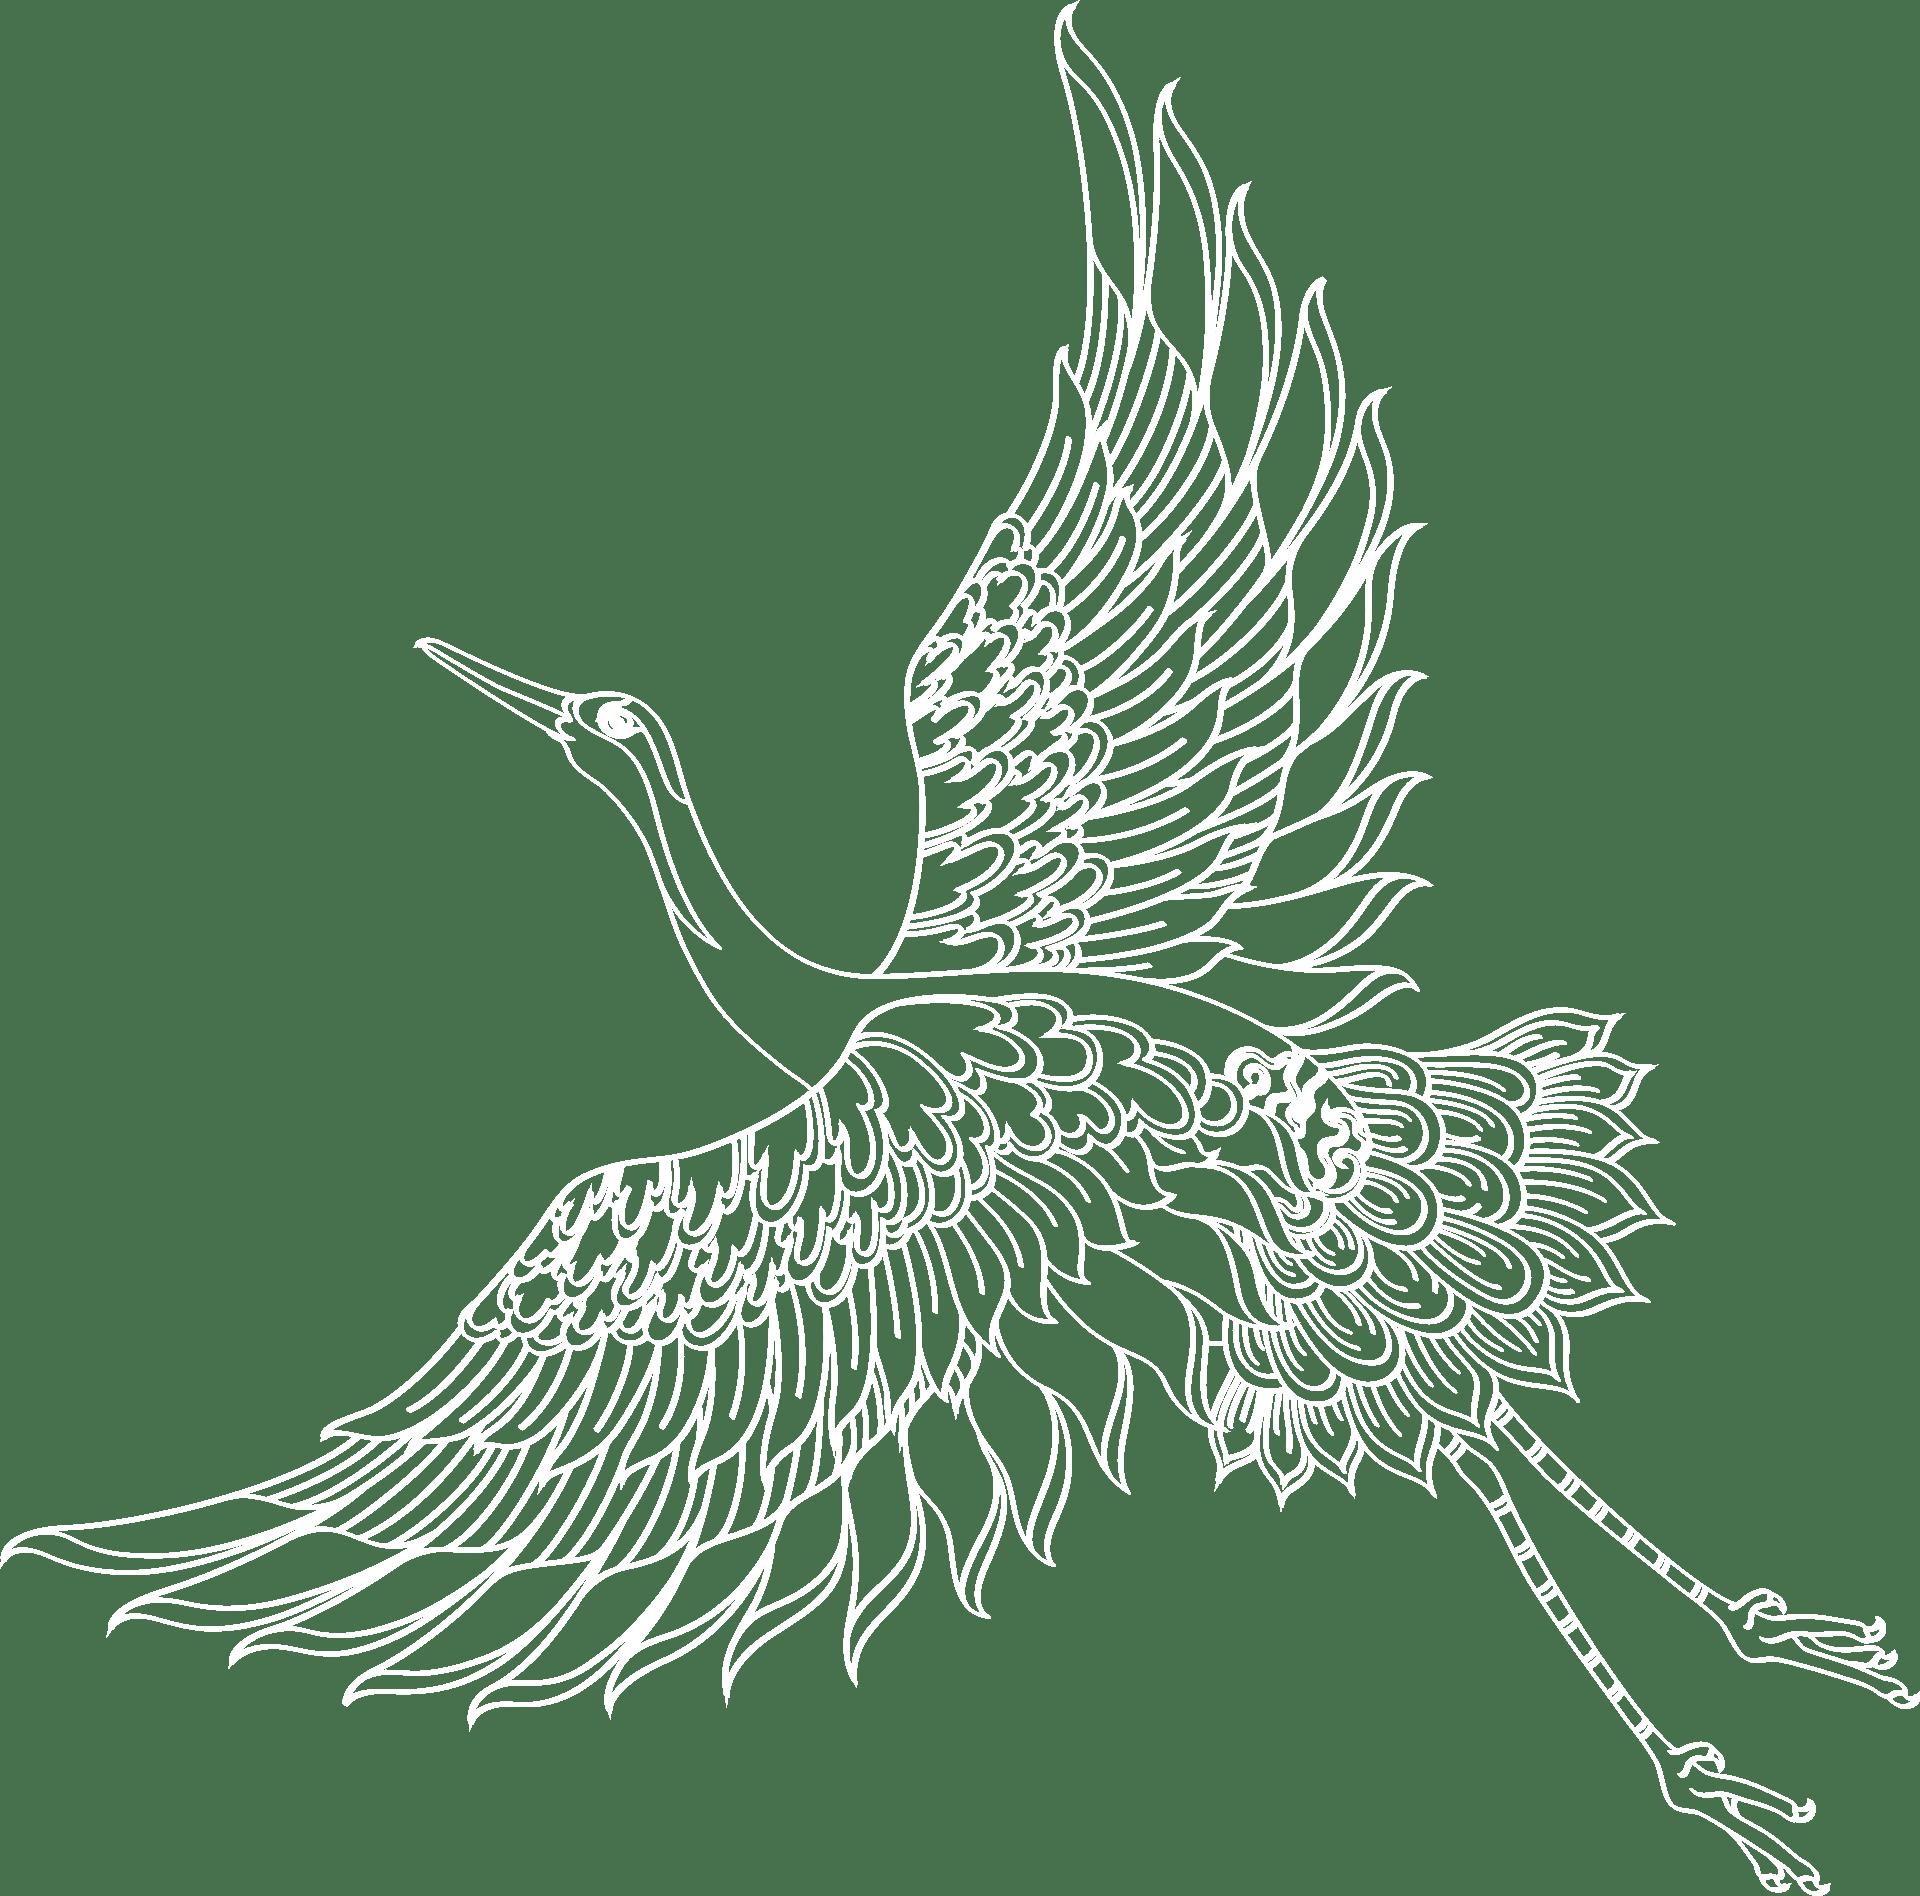 Журавль символ конкурса Беларусь 2020